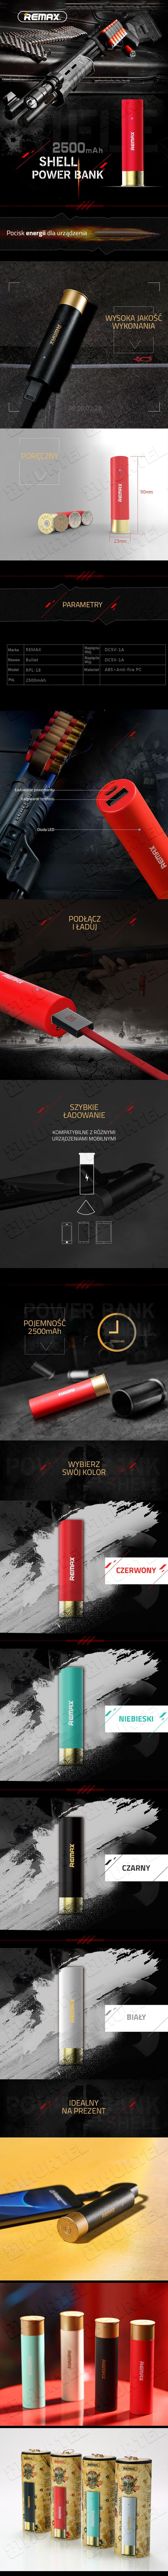 Power bank przenośny bank energii REMAX RPL-18 Shell Series 2500mAh czarny